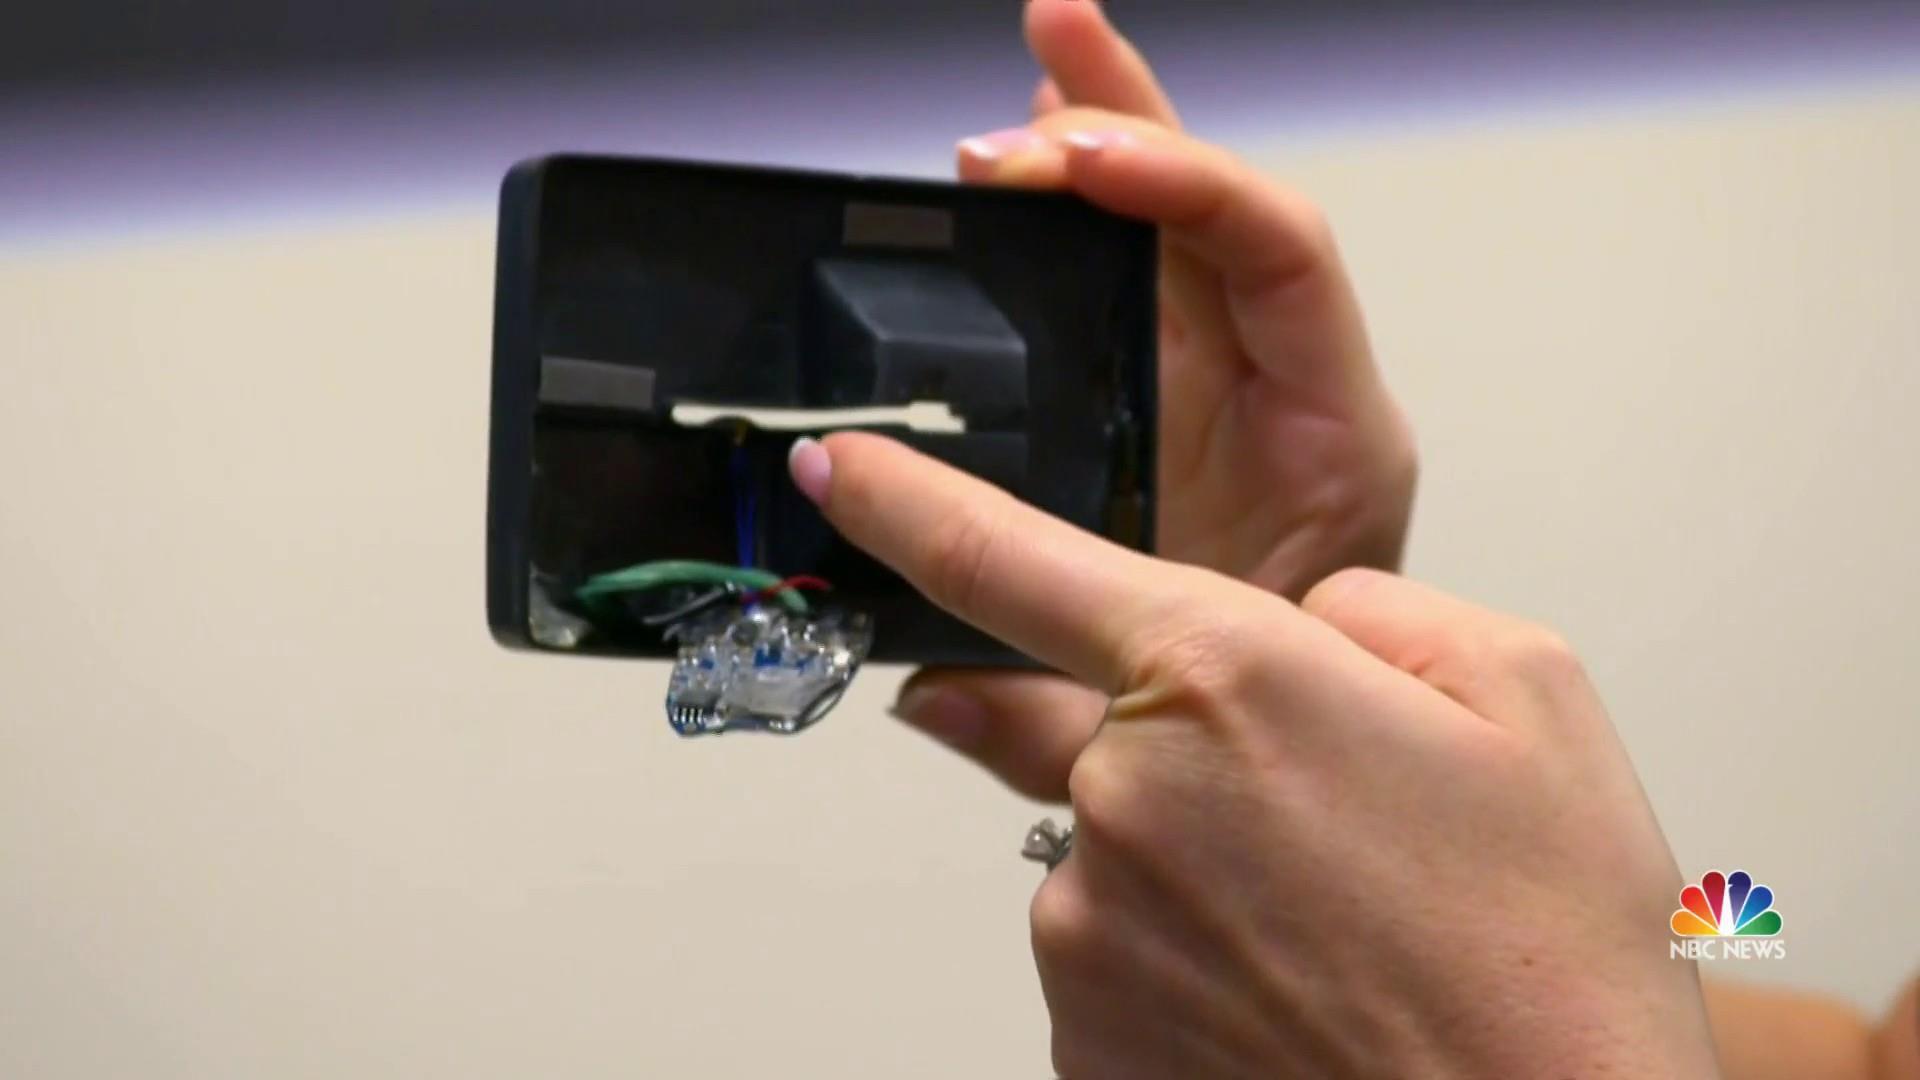 Secret Service cracks down on credit card skimming at gas pumps nationwide